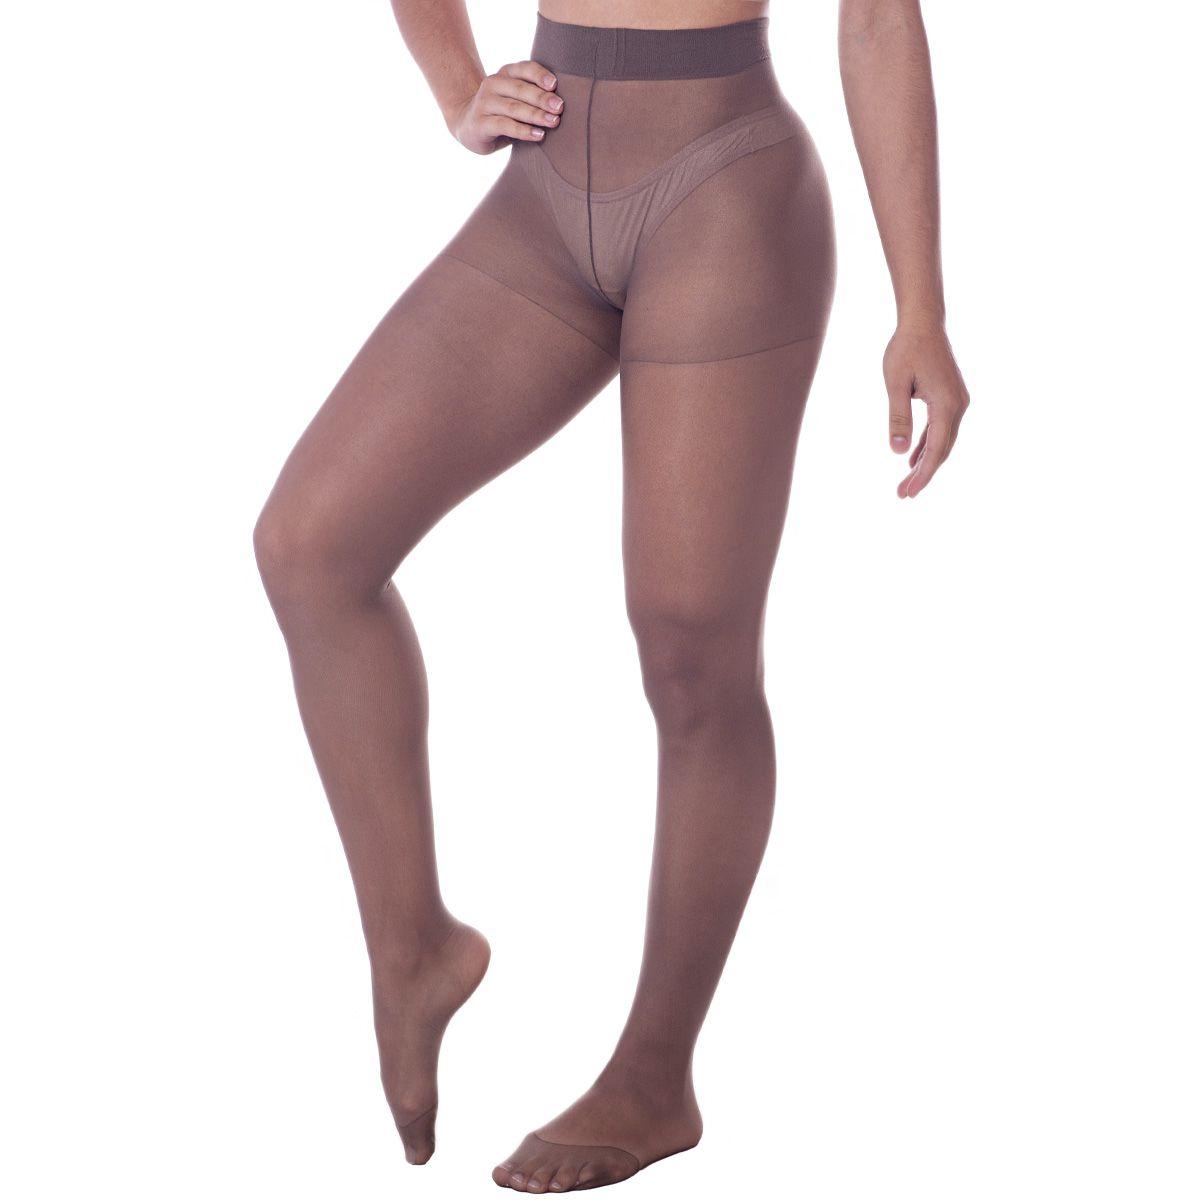 Meia Calça Feminina Adulto Modelo Clássica Adherence Fio 15 Trifil